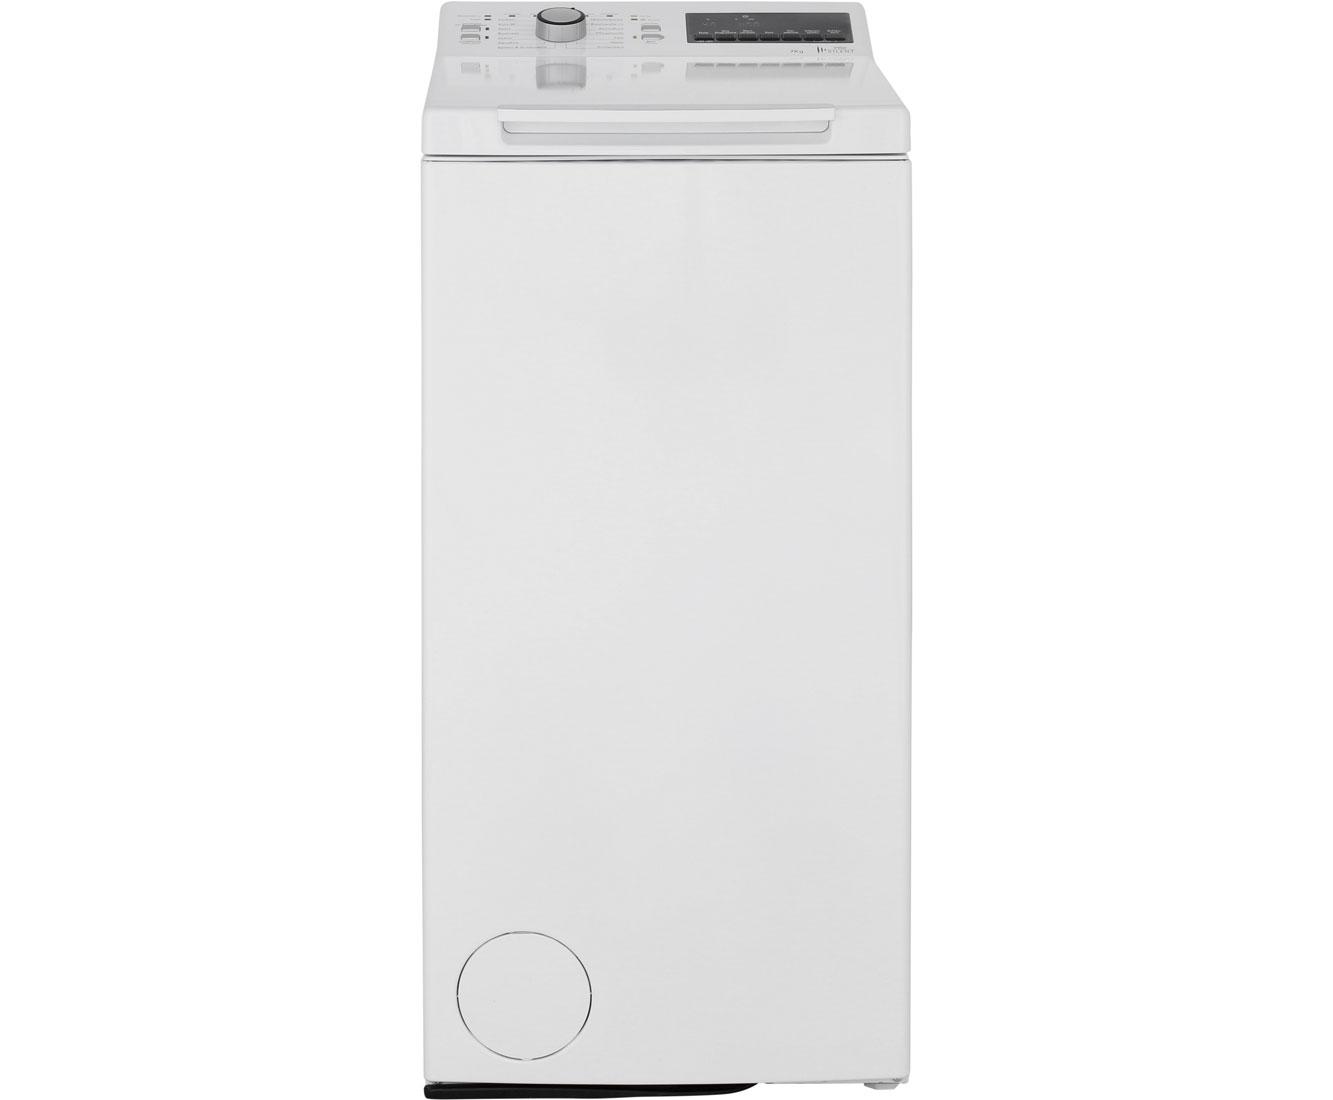 rabatt bad waschen trocknen waschmaschinen. Black Bedroom Furniture Sets. Home Design Ideas